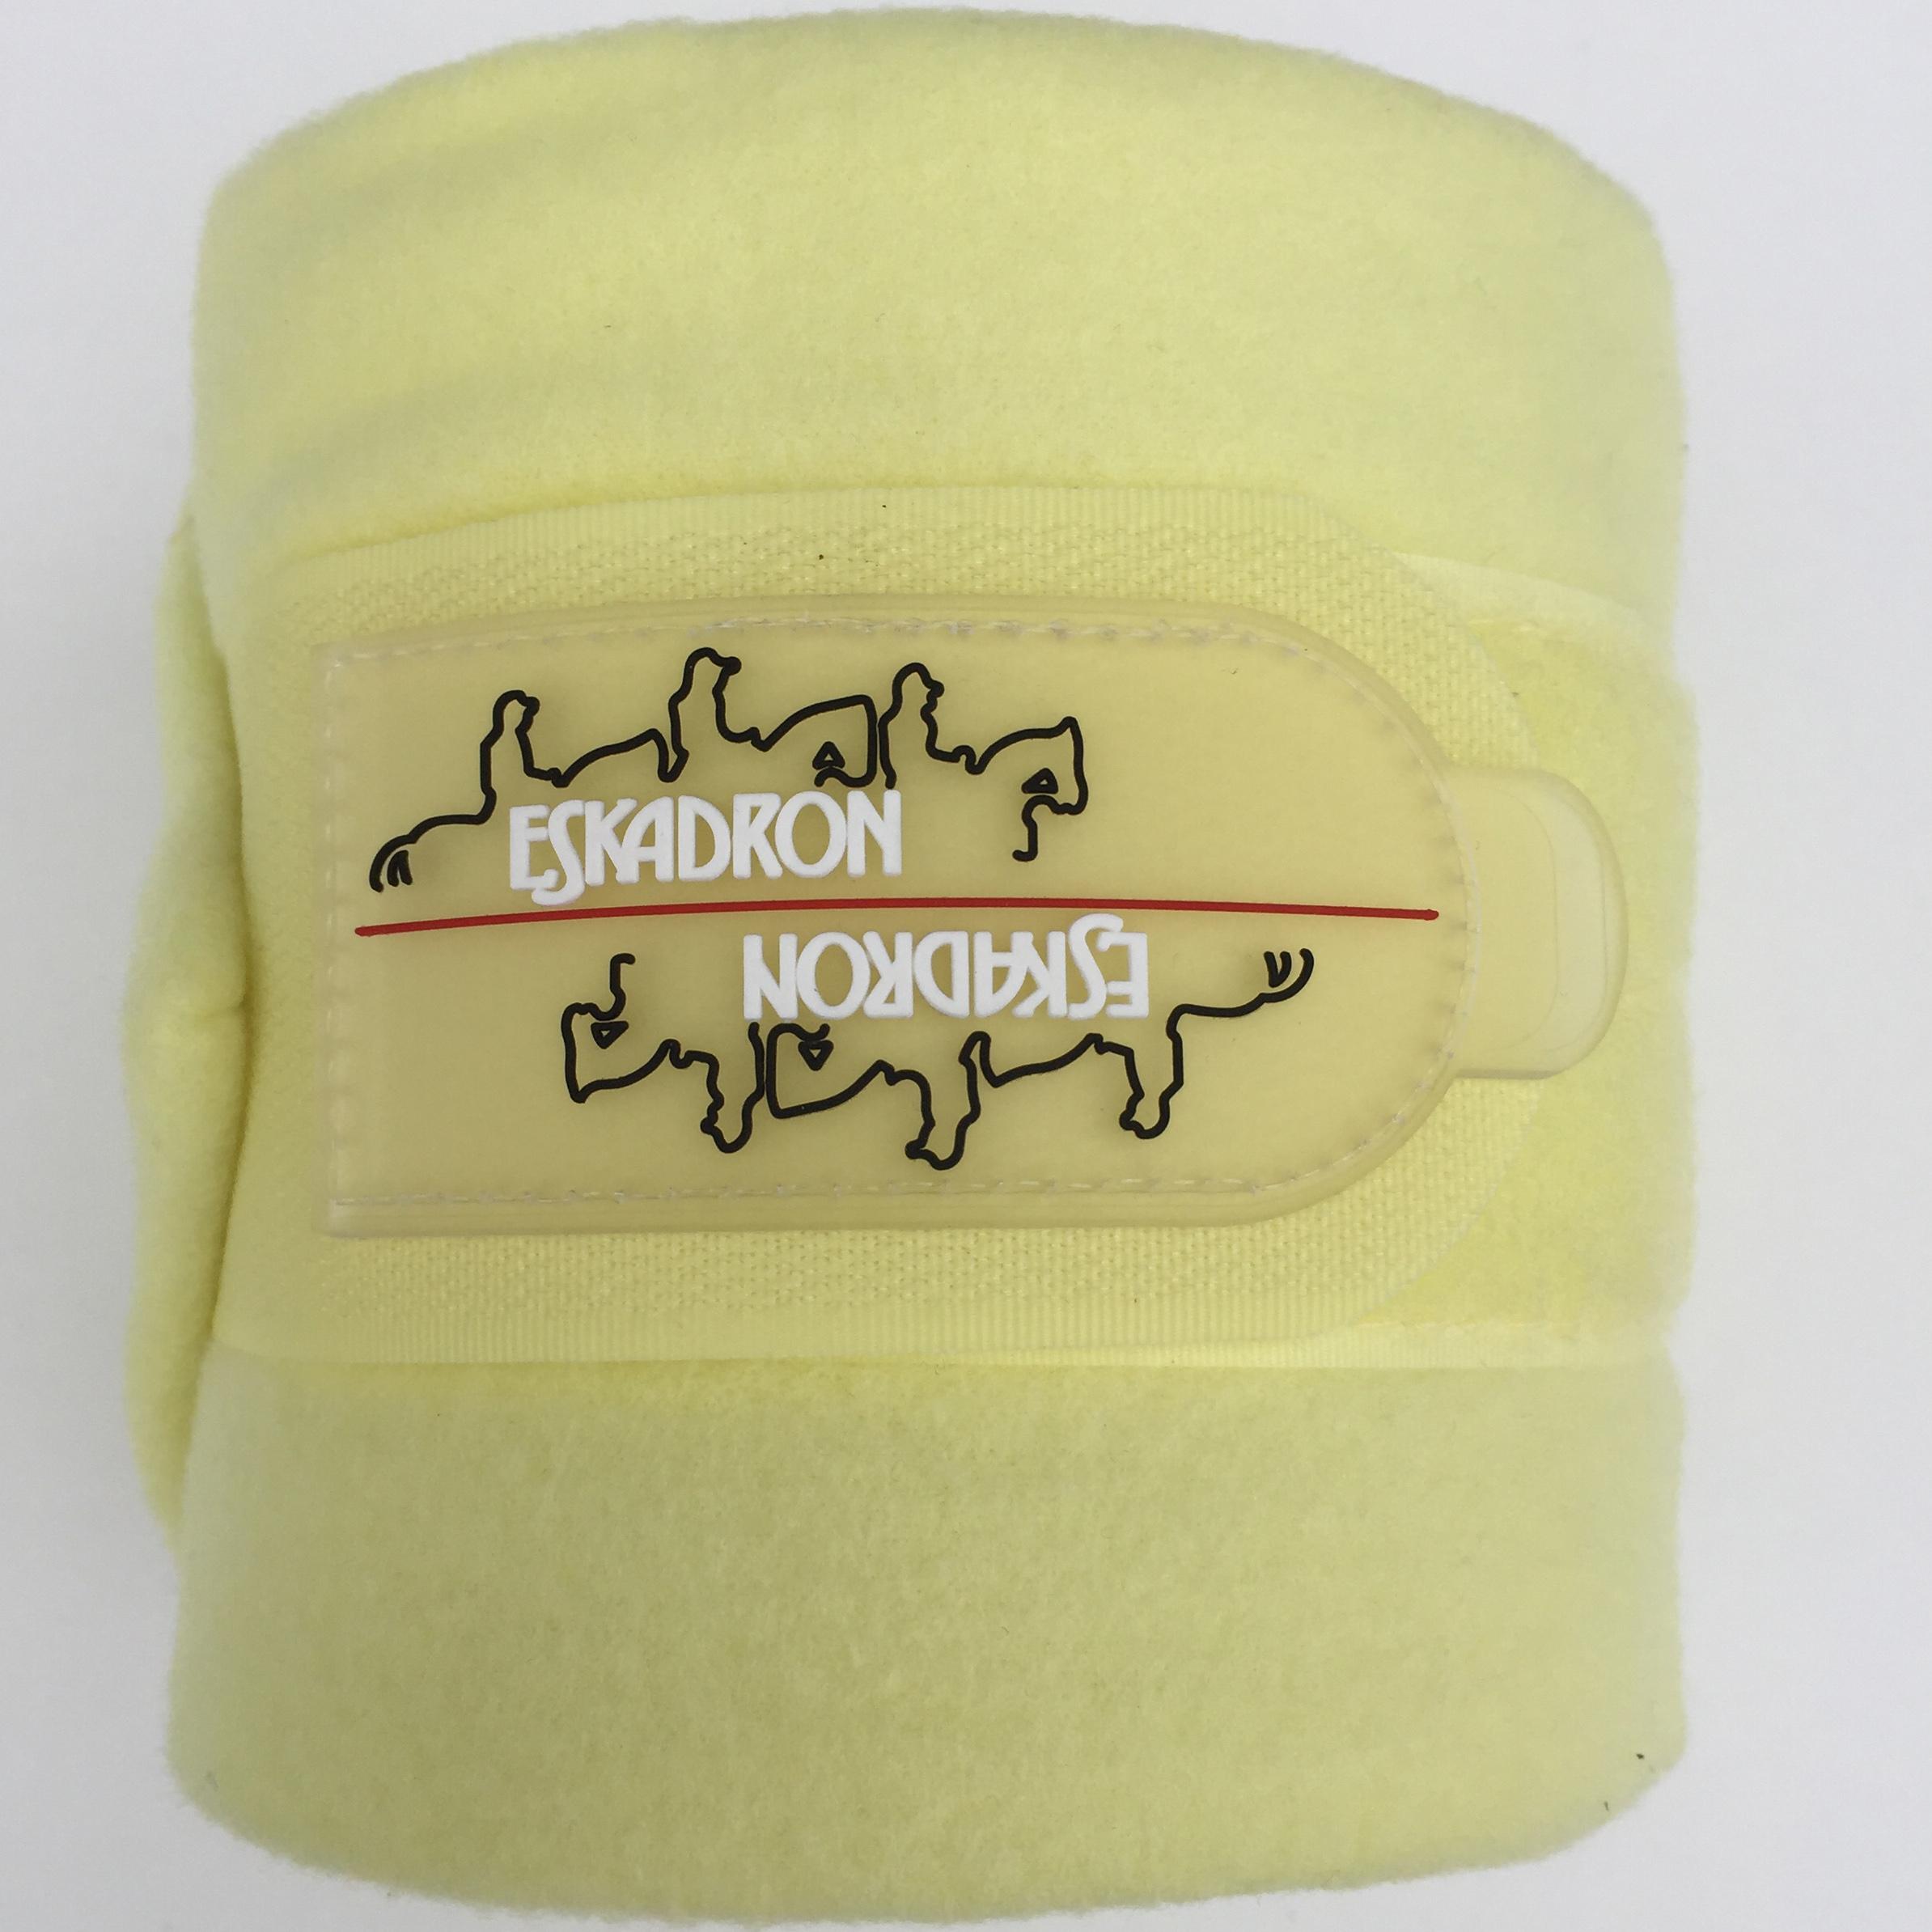 Eskadron Fleecebandagen pastell yellow, 4er Set in Warmblut